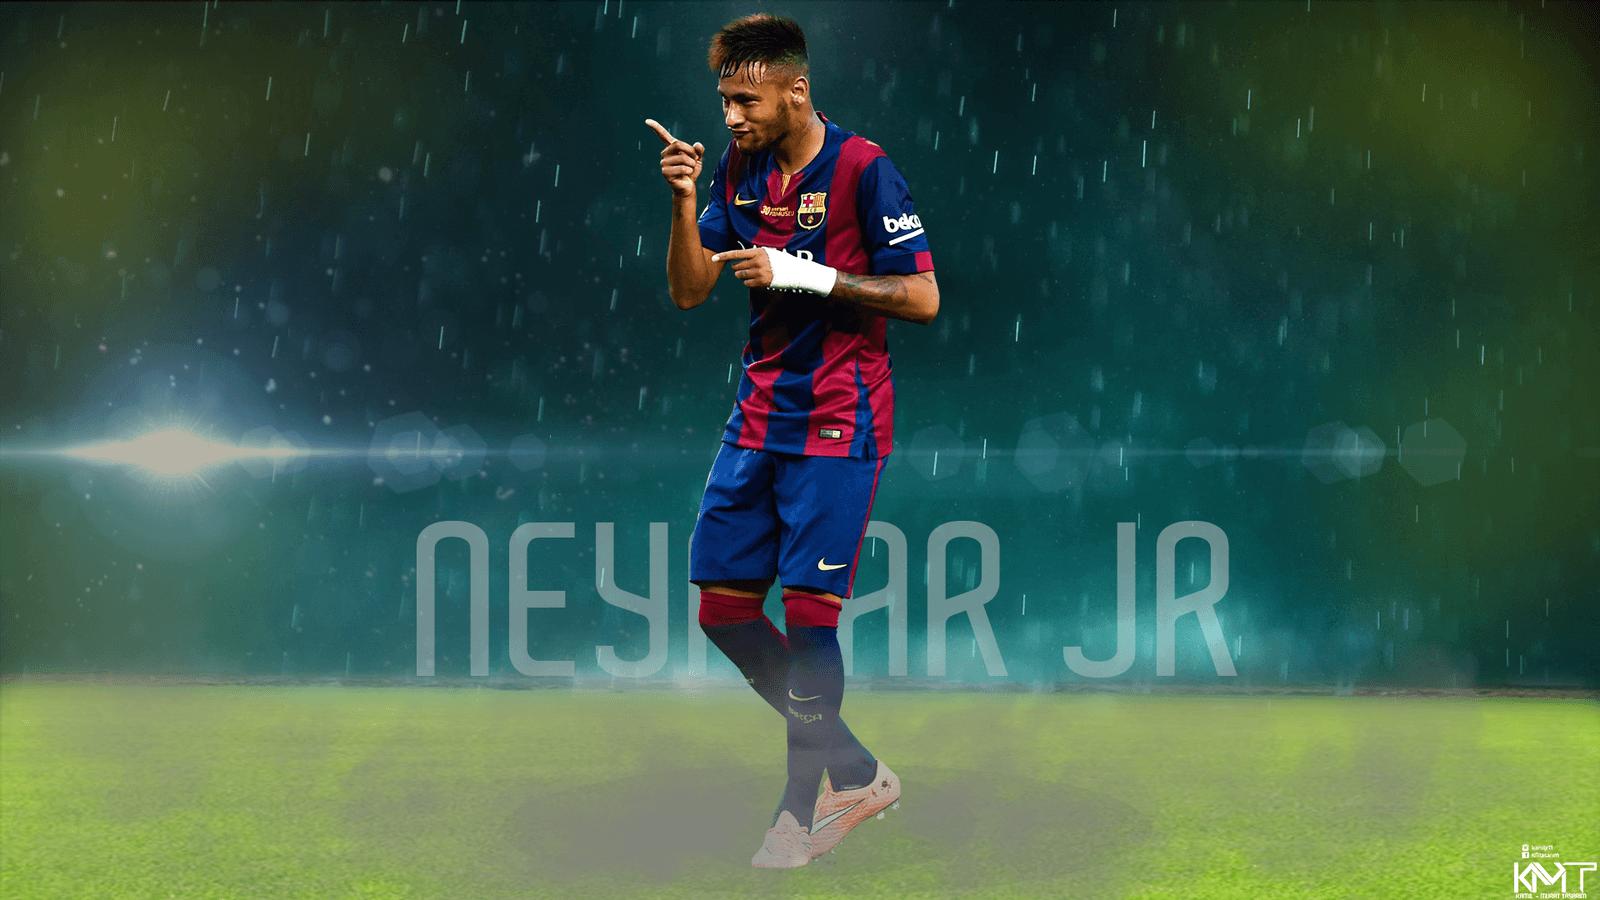 messi ronaldo and neymar wallpaper